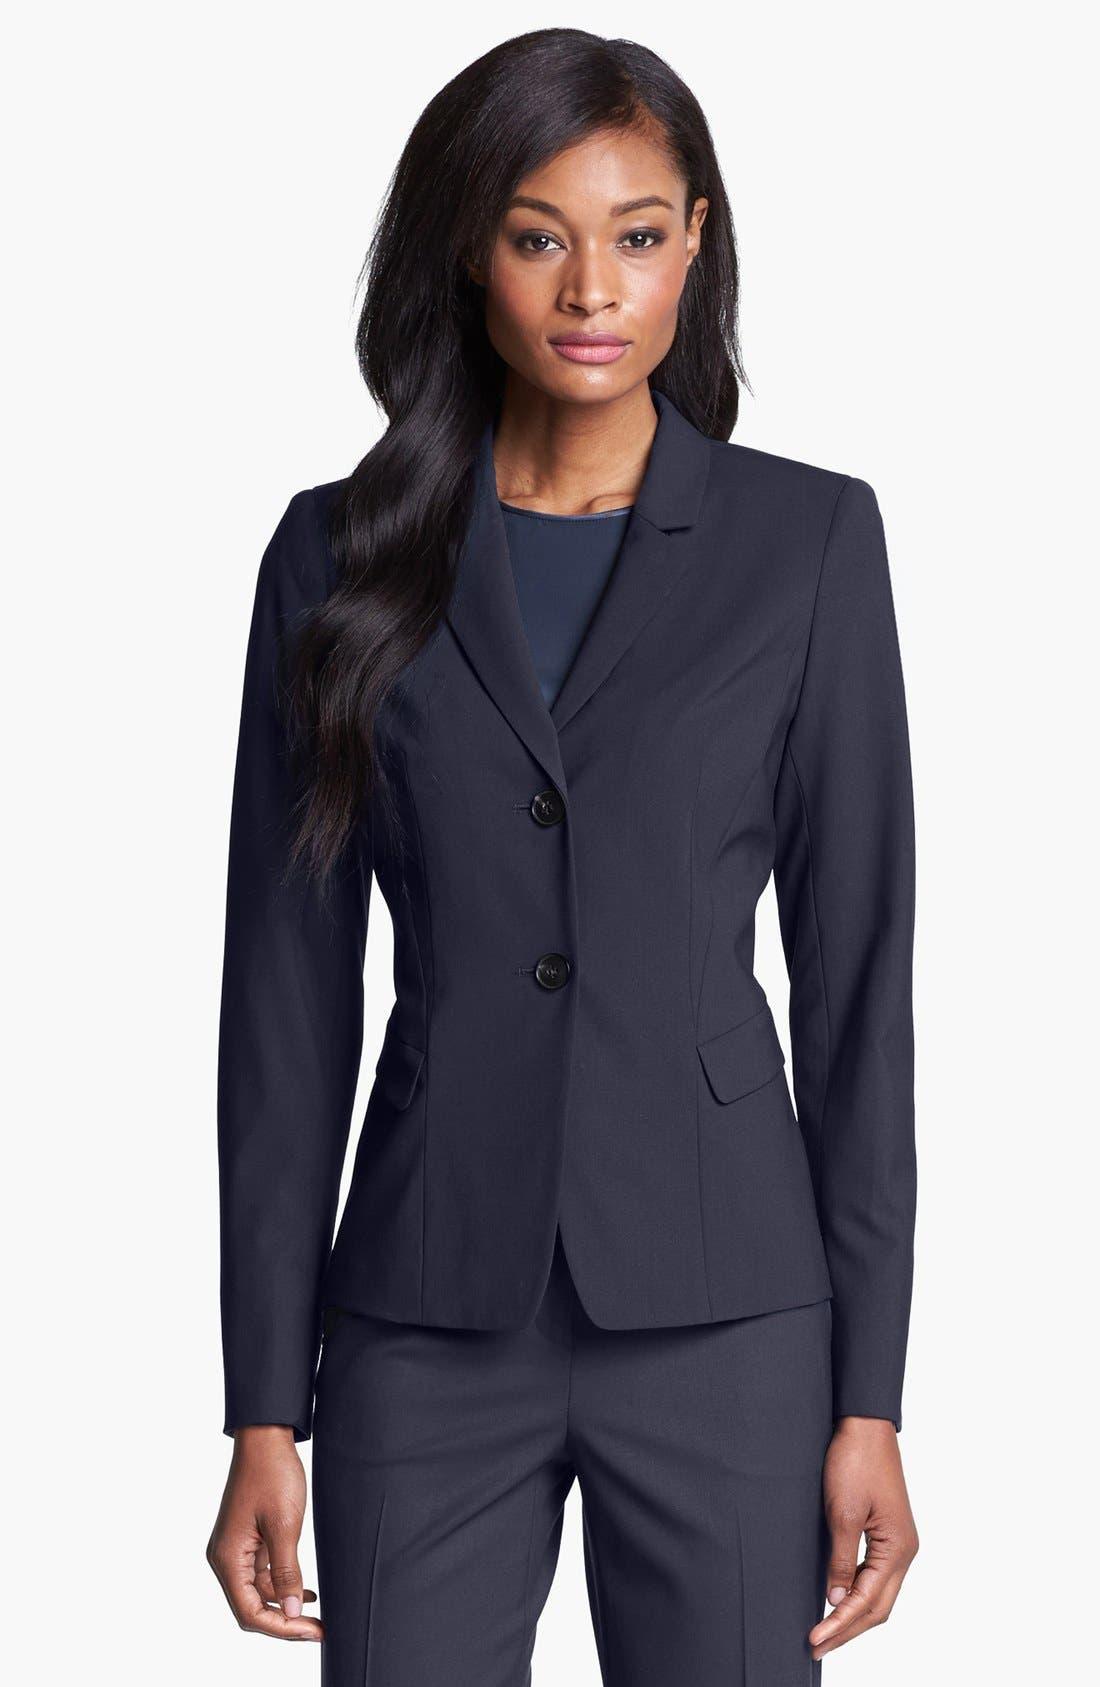 Alternate Image 1 Selected - Lafayette 148 New York 'Willa' Stretch Wool Jacket